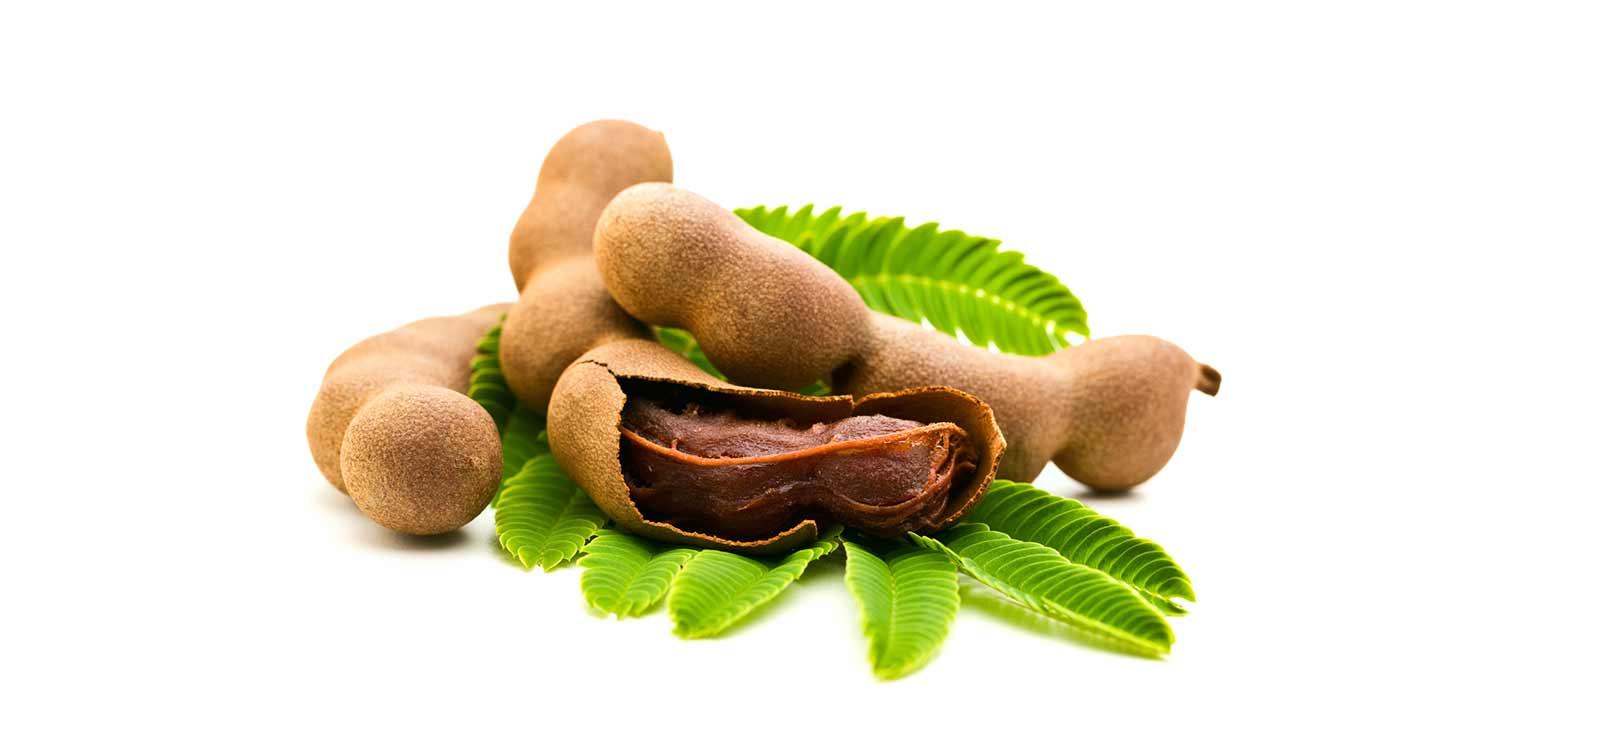 4 Healthy Benefits Of The Tamarind Fruit